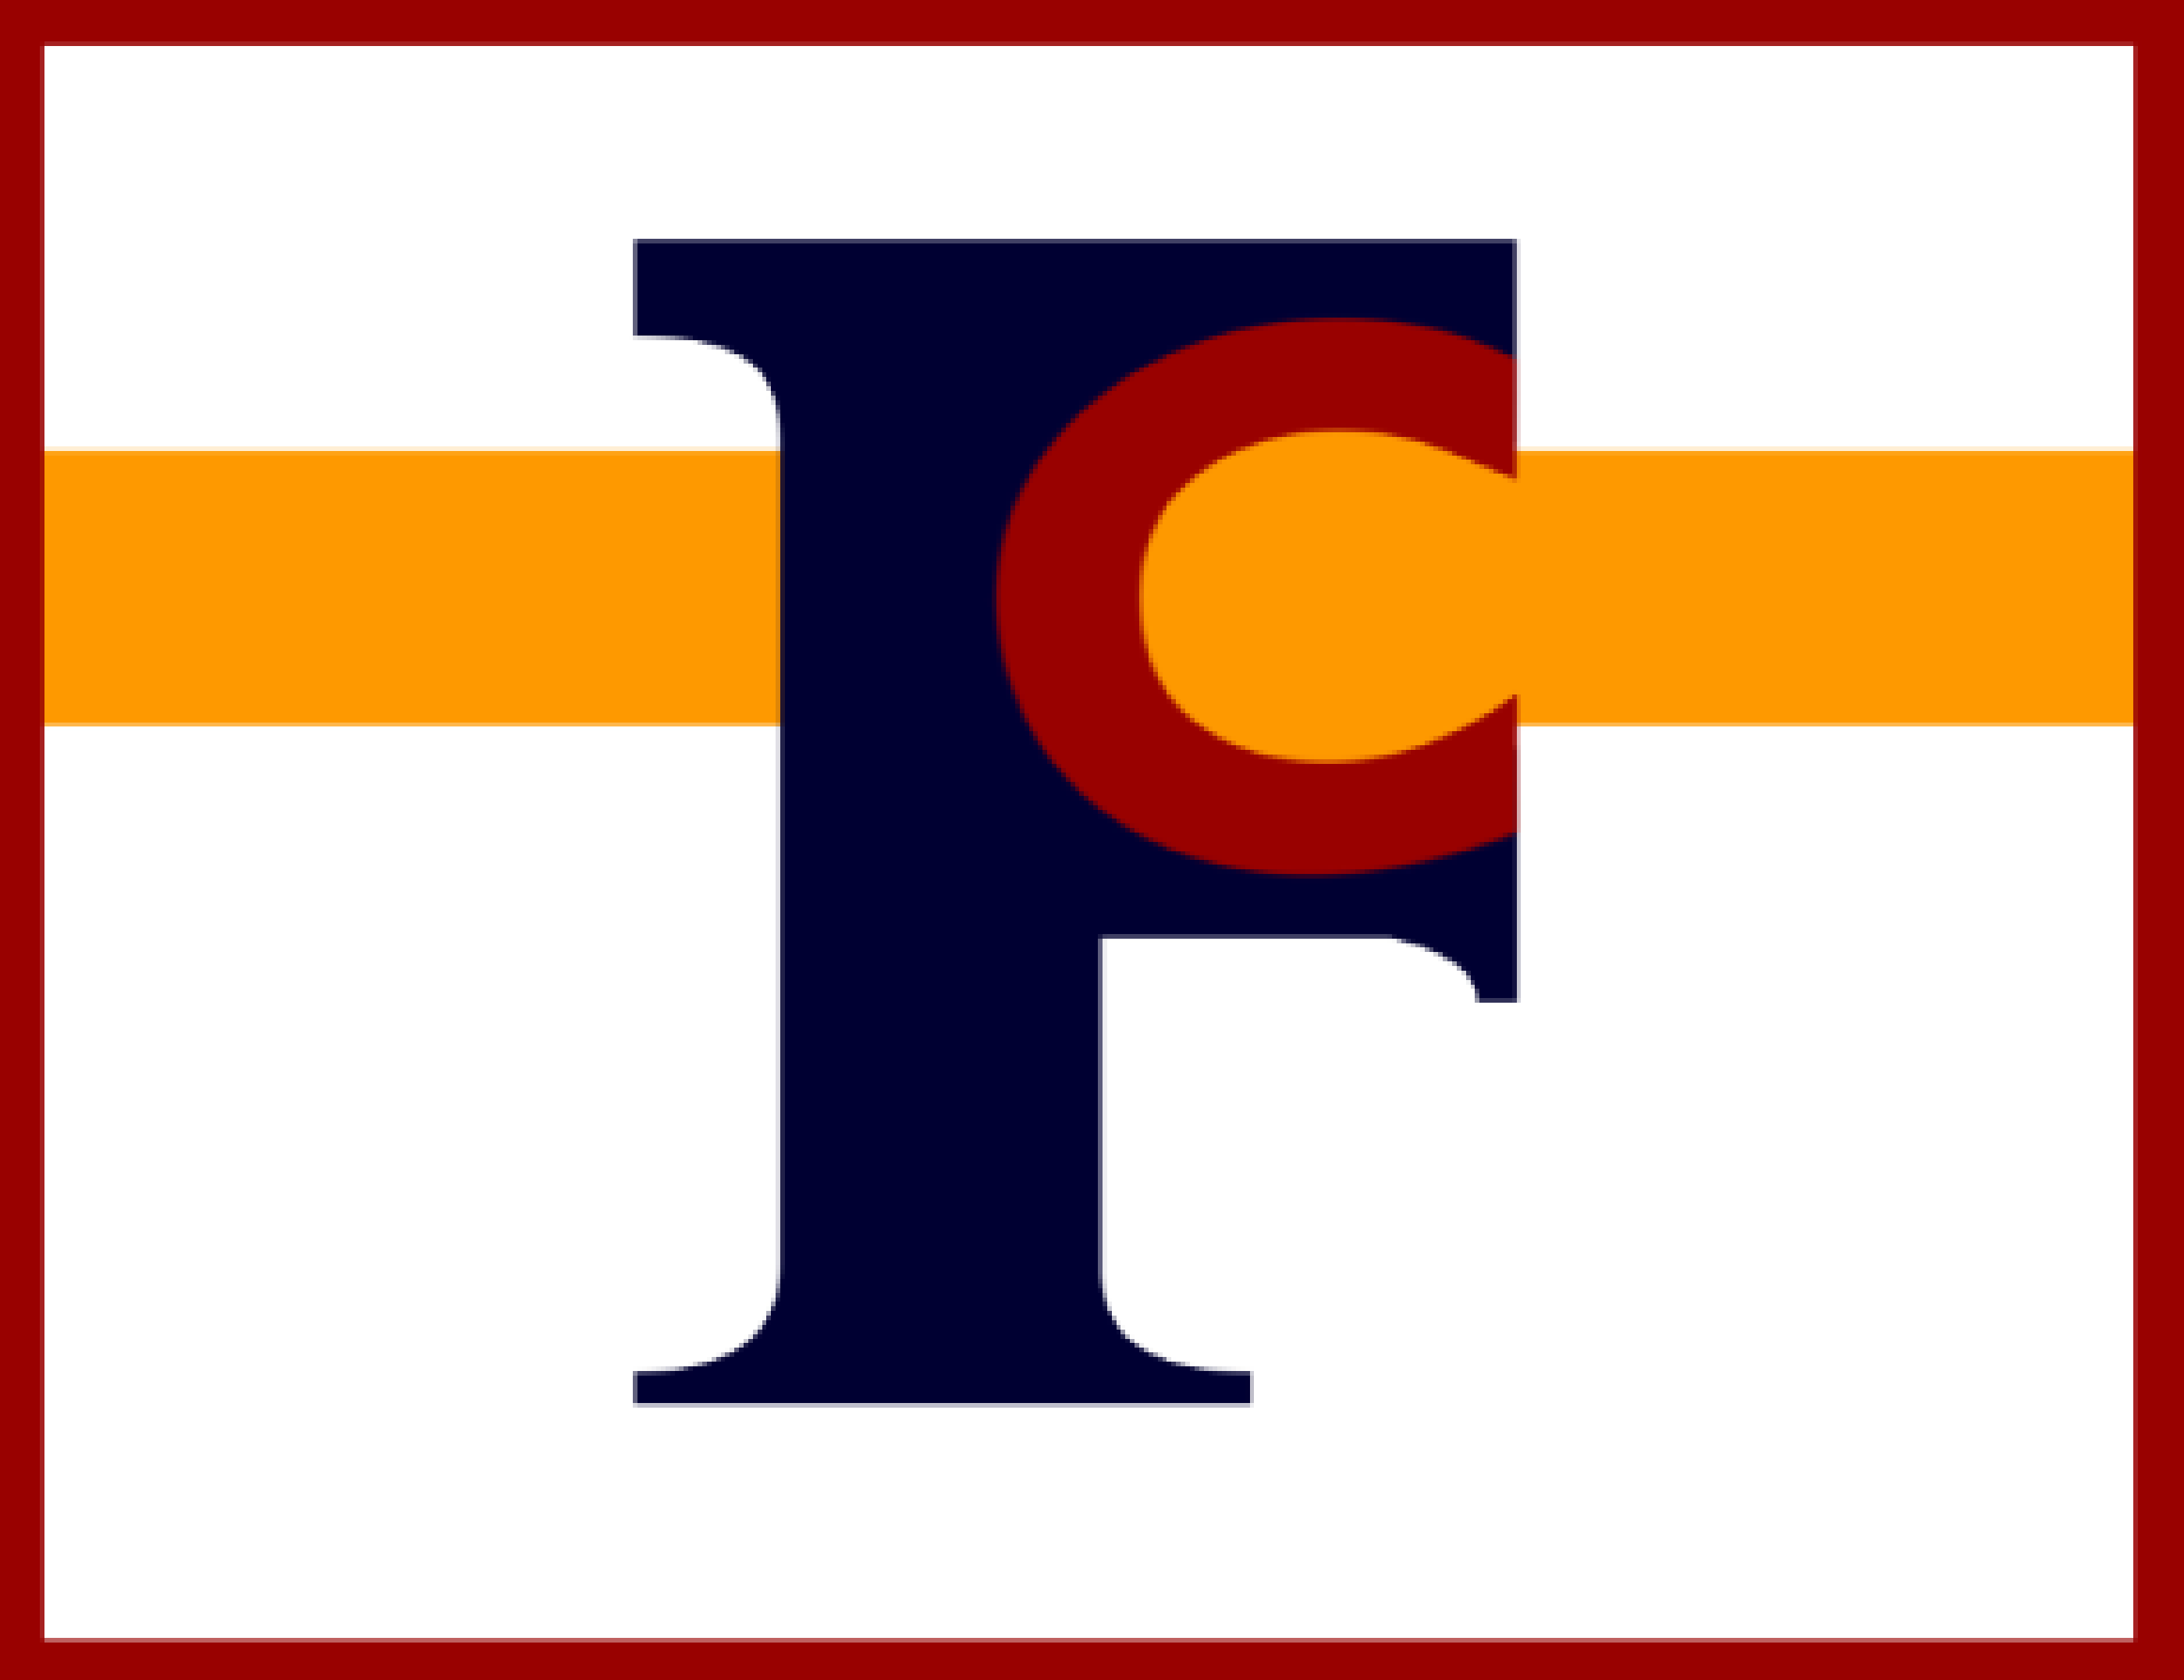 City of Florence logo